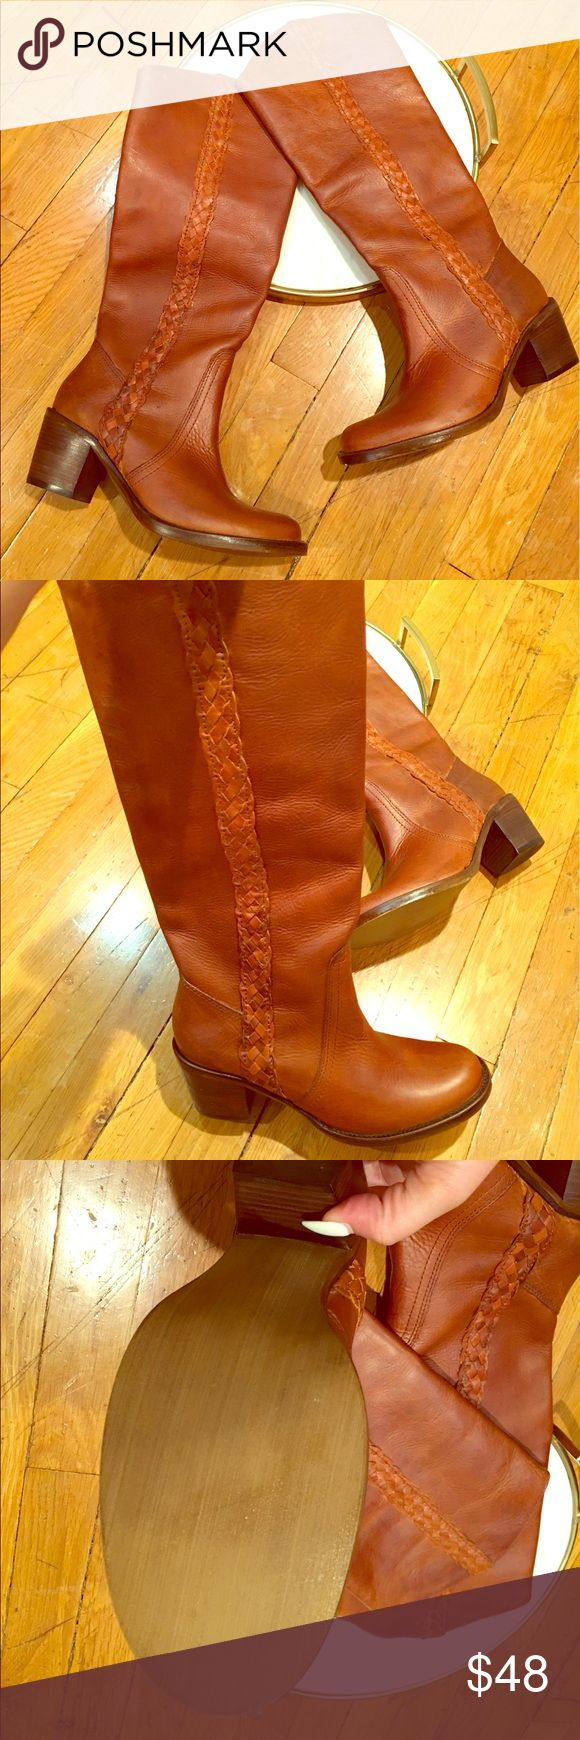 Steve Madden Brown/tan/beige Knee High Boots Steve Madden Brown/tan/beige Knee High Boots leather Size 8.5 Cow Boy Boots Steve Madden Shoes Heeled Boots